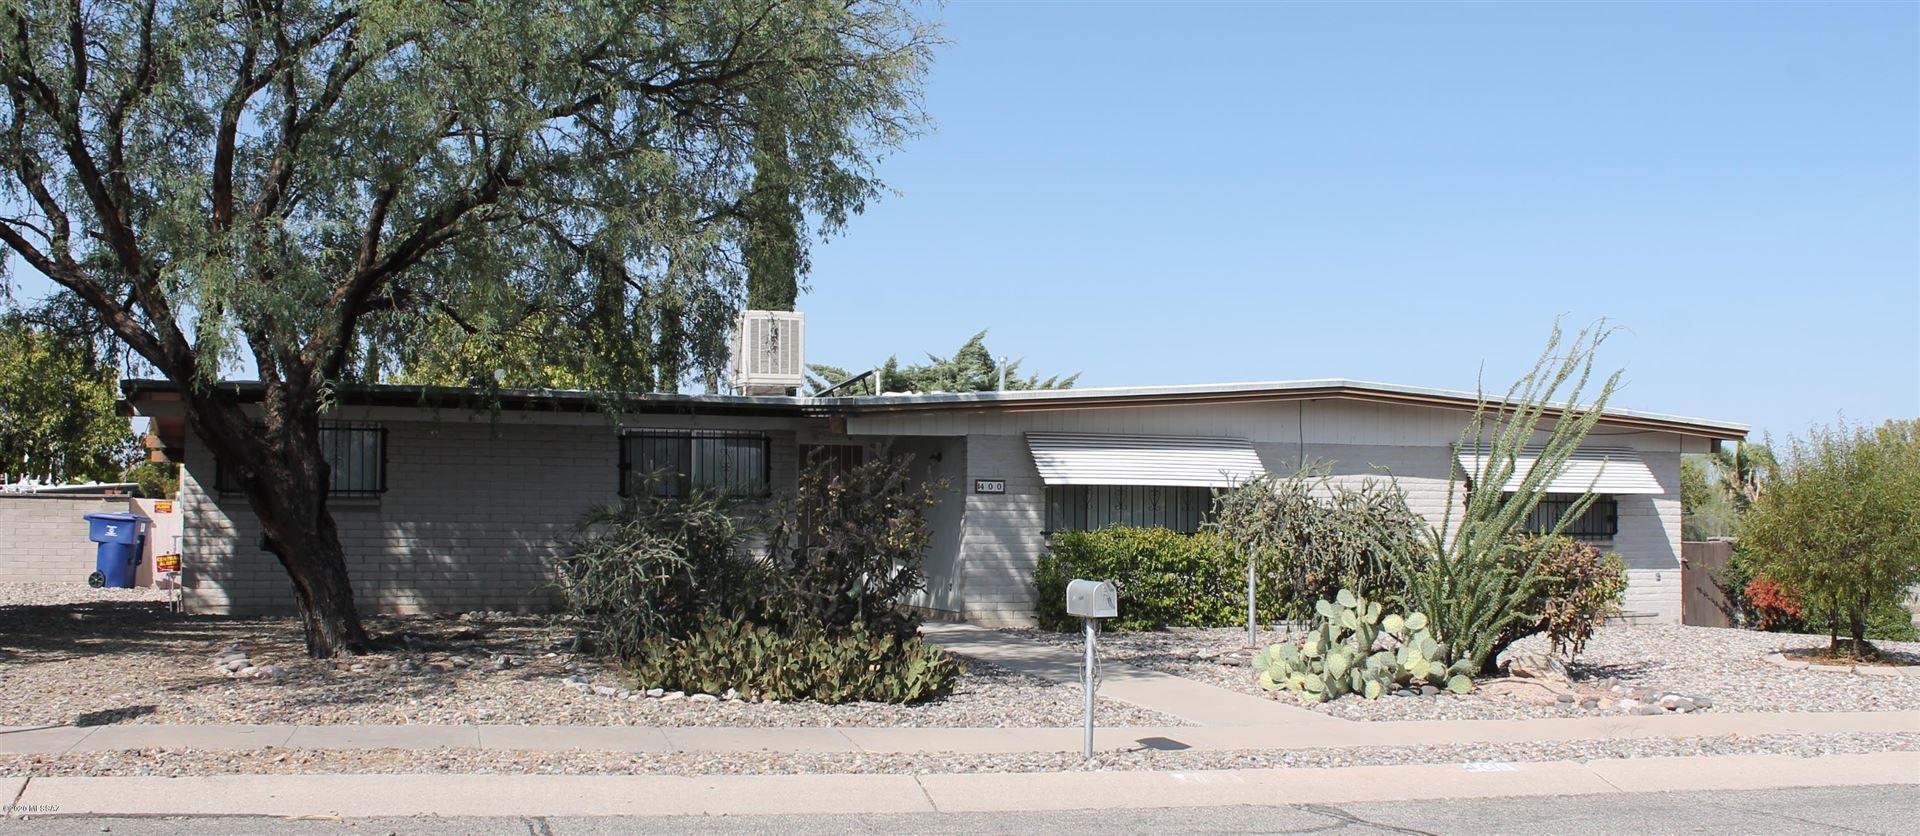 400 S Porter Avenue, Tucson, AZ 85710 - MLS#: 22023809